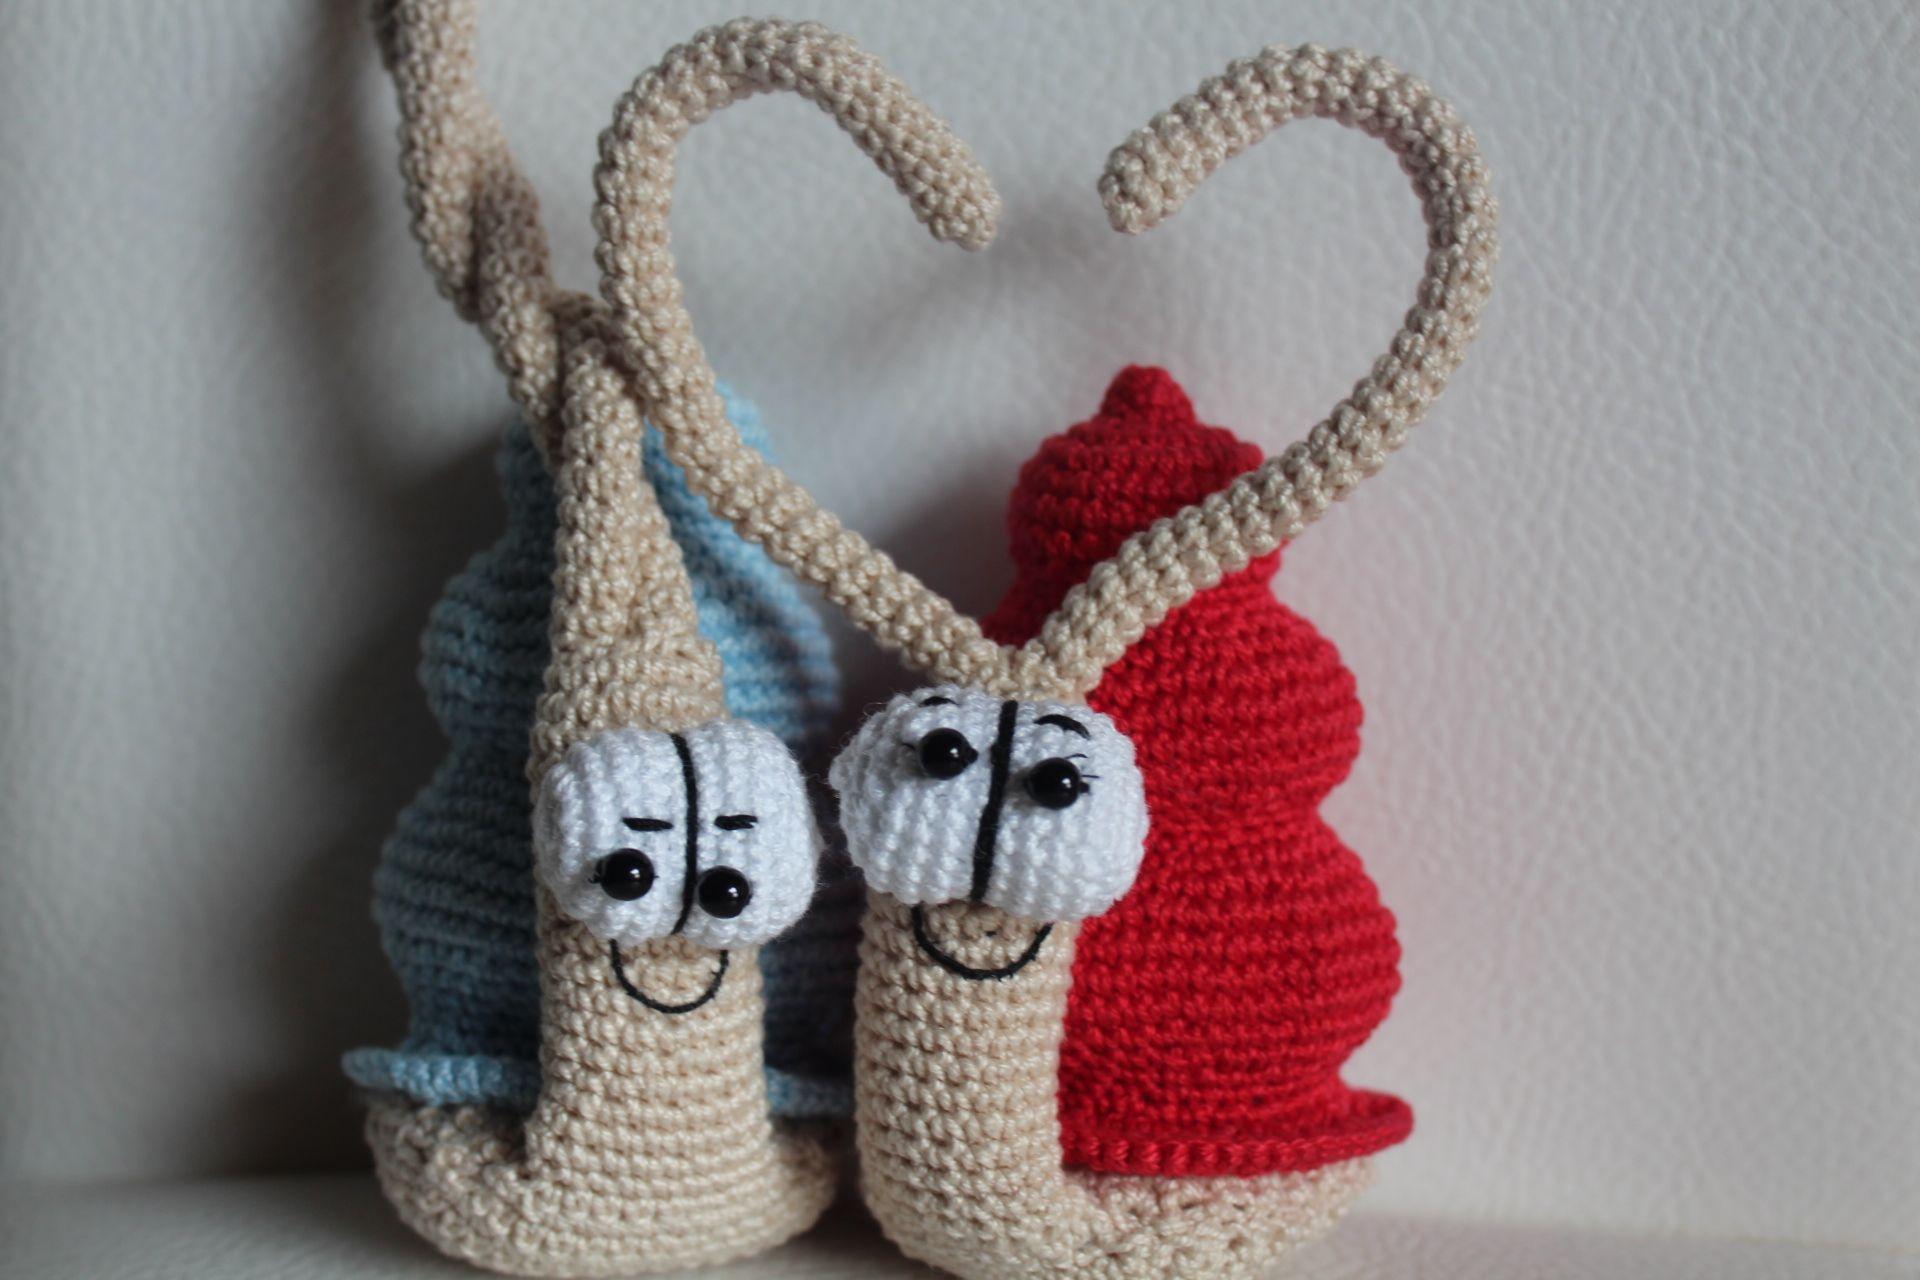 Amigurumi Tutorial Animali : Lumaca antenne a cuore amigurumi schema gratis crochet tutorial